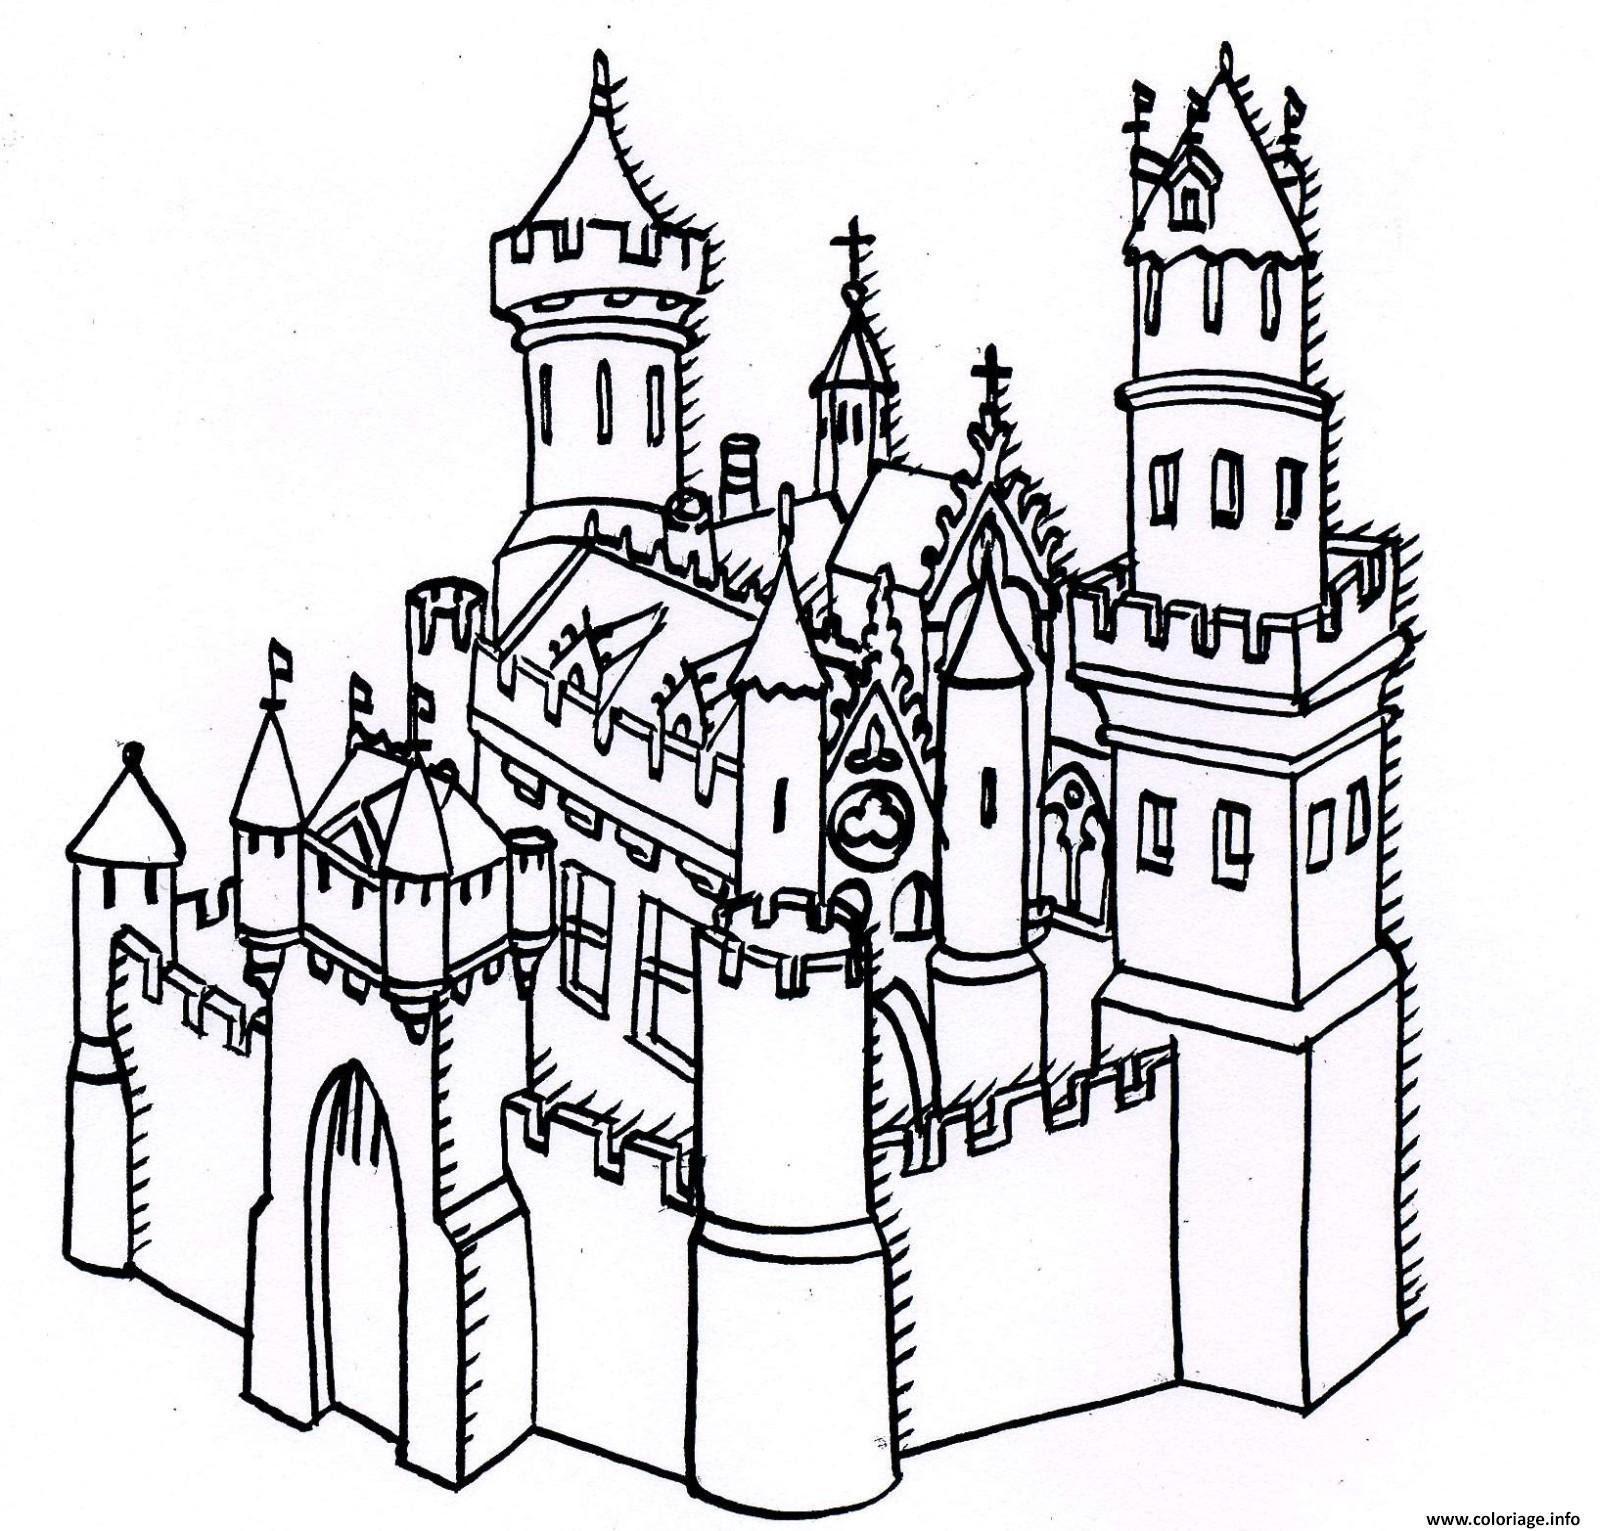 Coloriage Chateau Forteresse Dessin  Imprimer